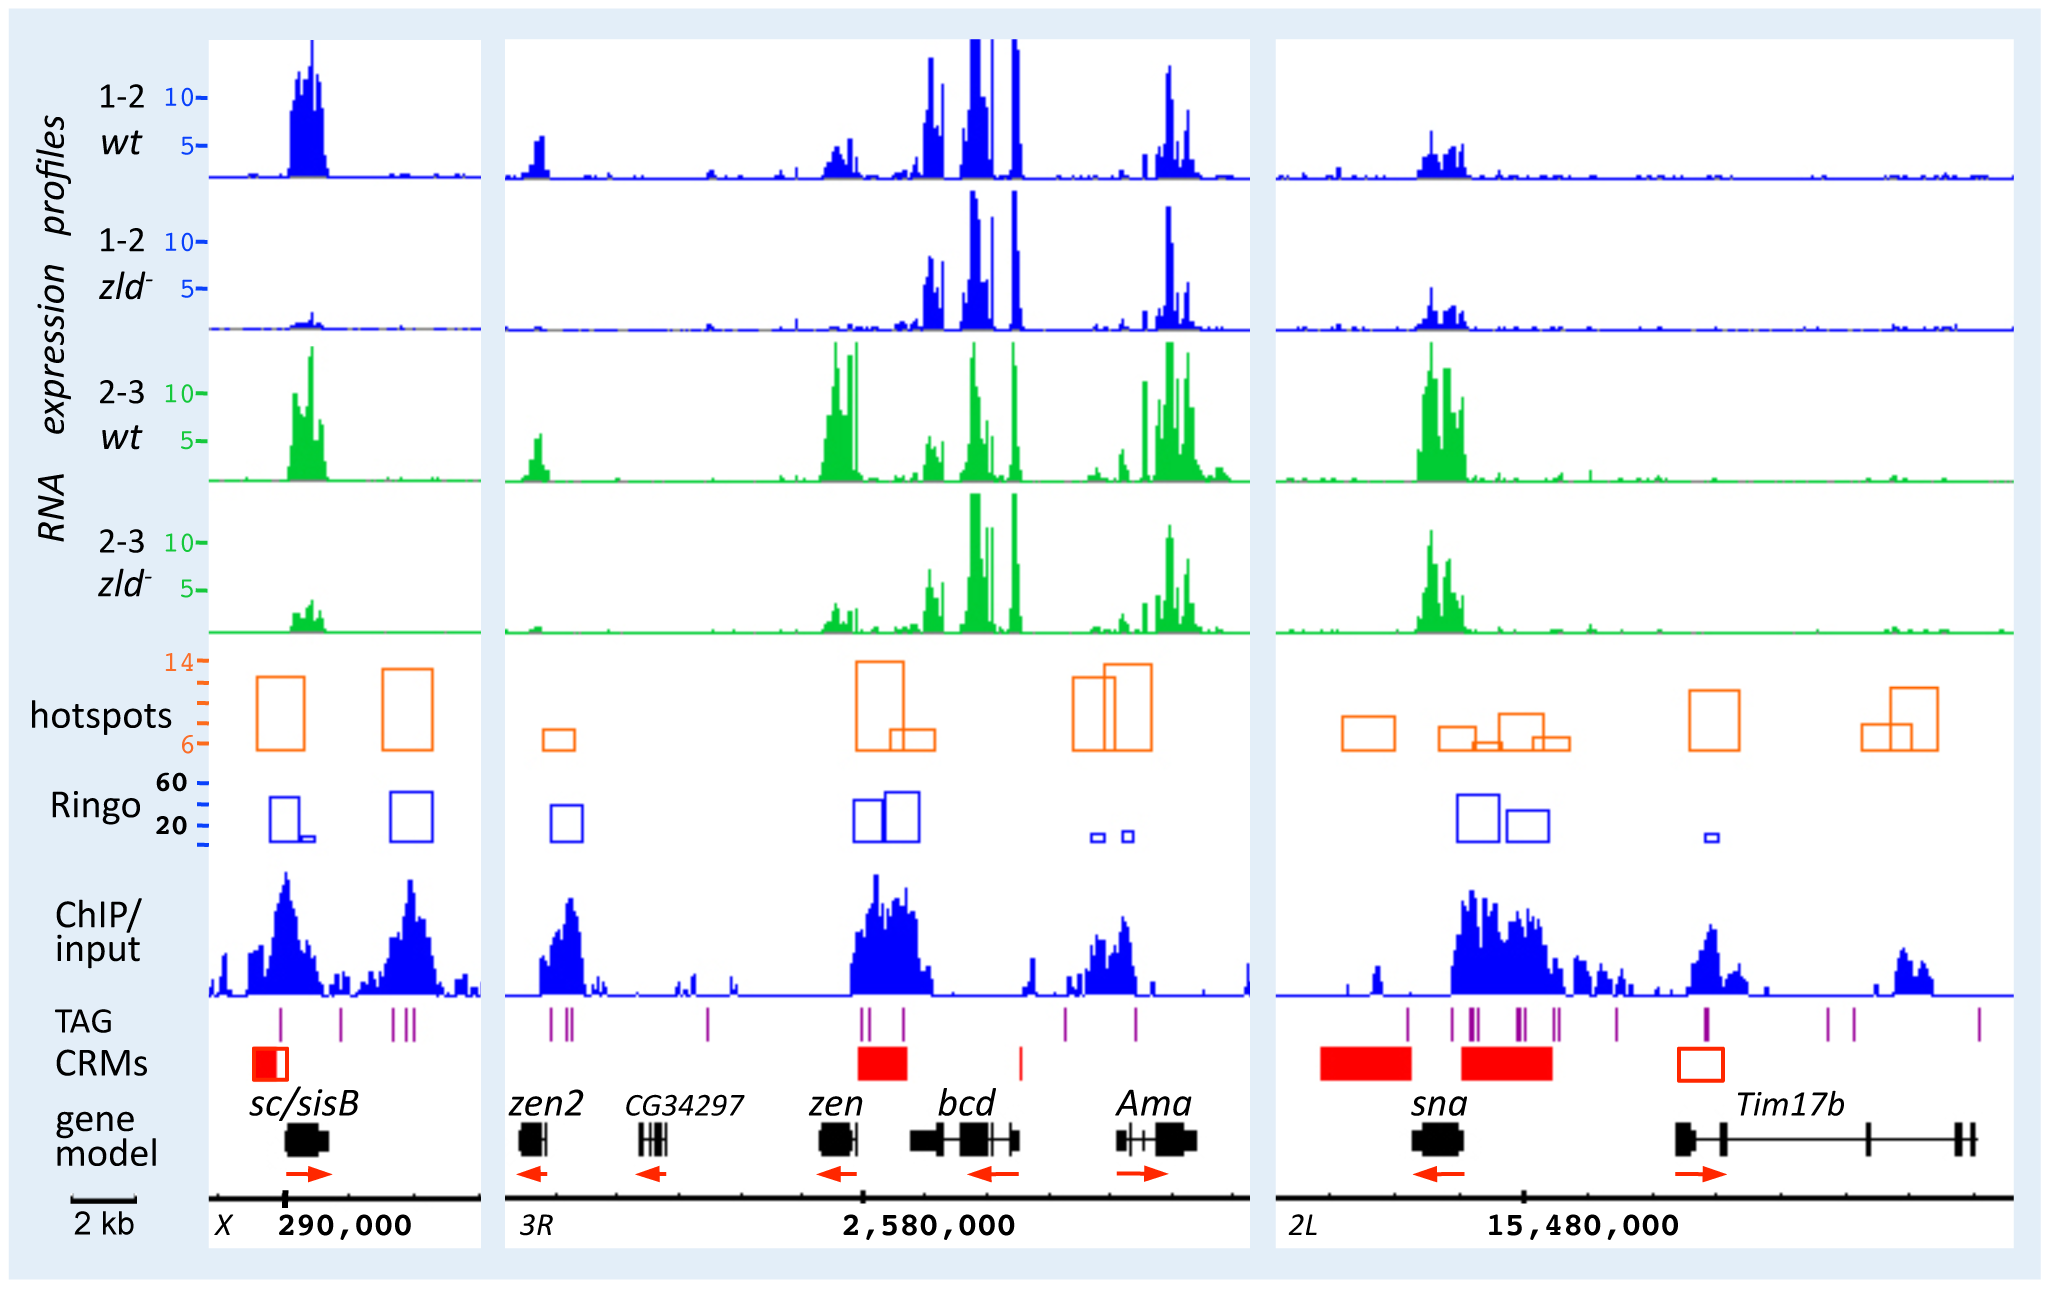 Zld binds to defined enhancer regions of <i>sc/sisB</i>, <i>zen</i>, and <i>sna</i>.